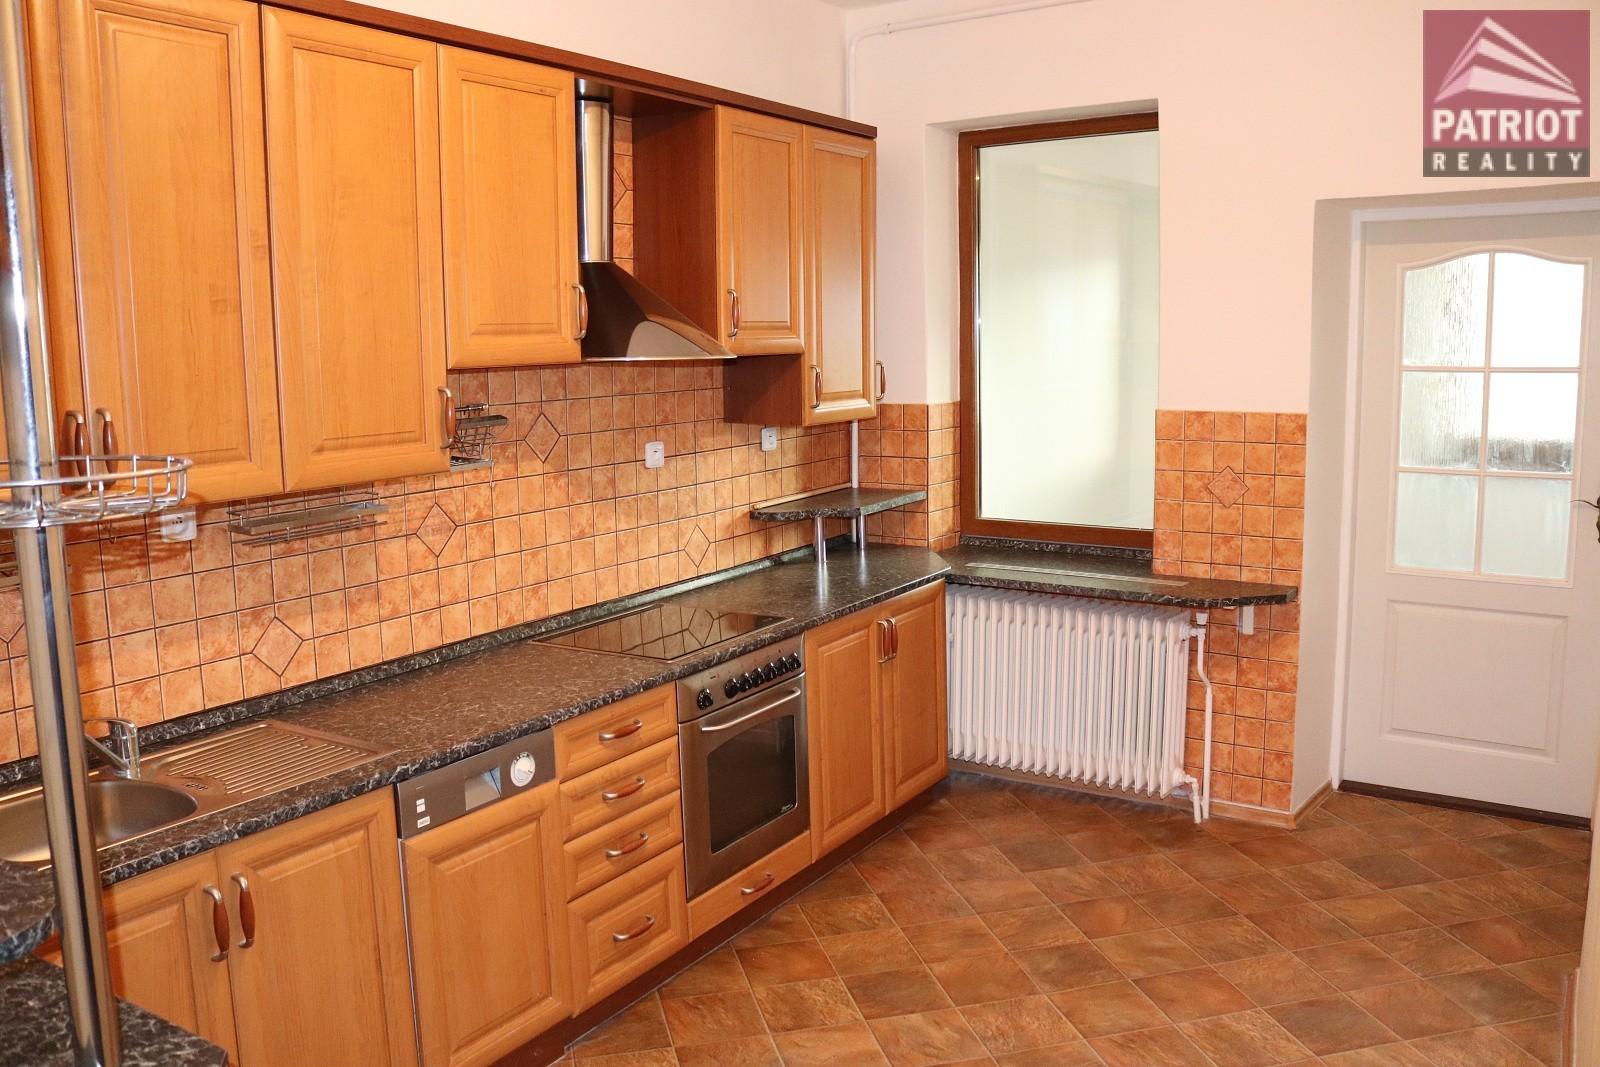 Mezonetový byt 5+1 Rejskova v Olomouci   PRODÁNO - 5